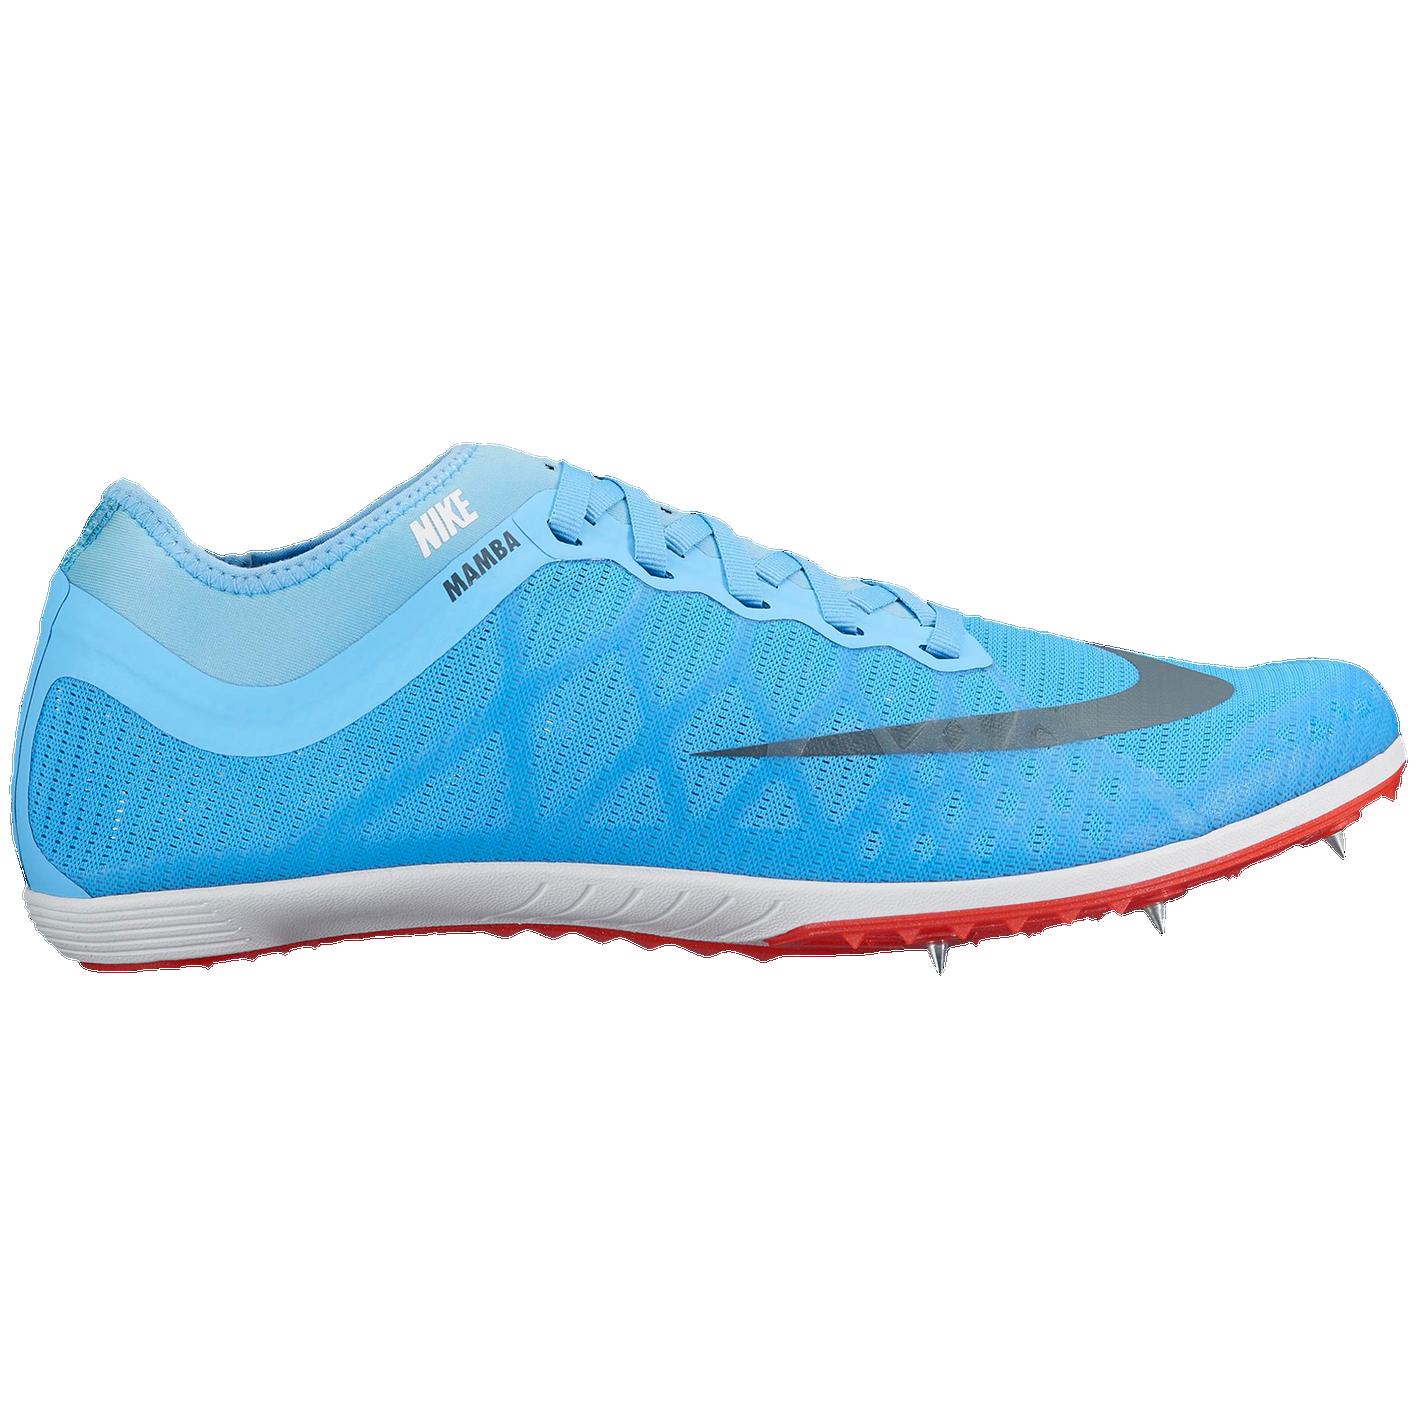 finest selection 2d0b4 3829e Nike Zoom Mamba 3 - Men s